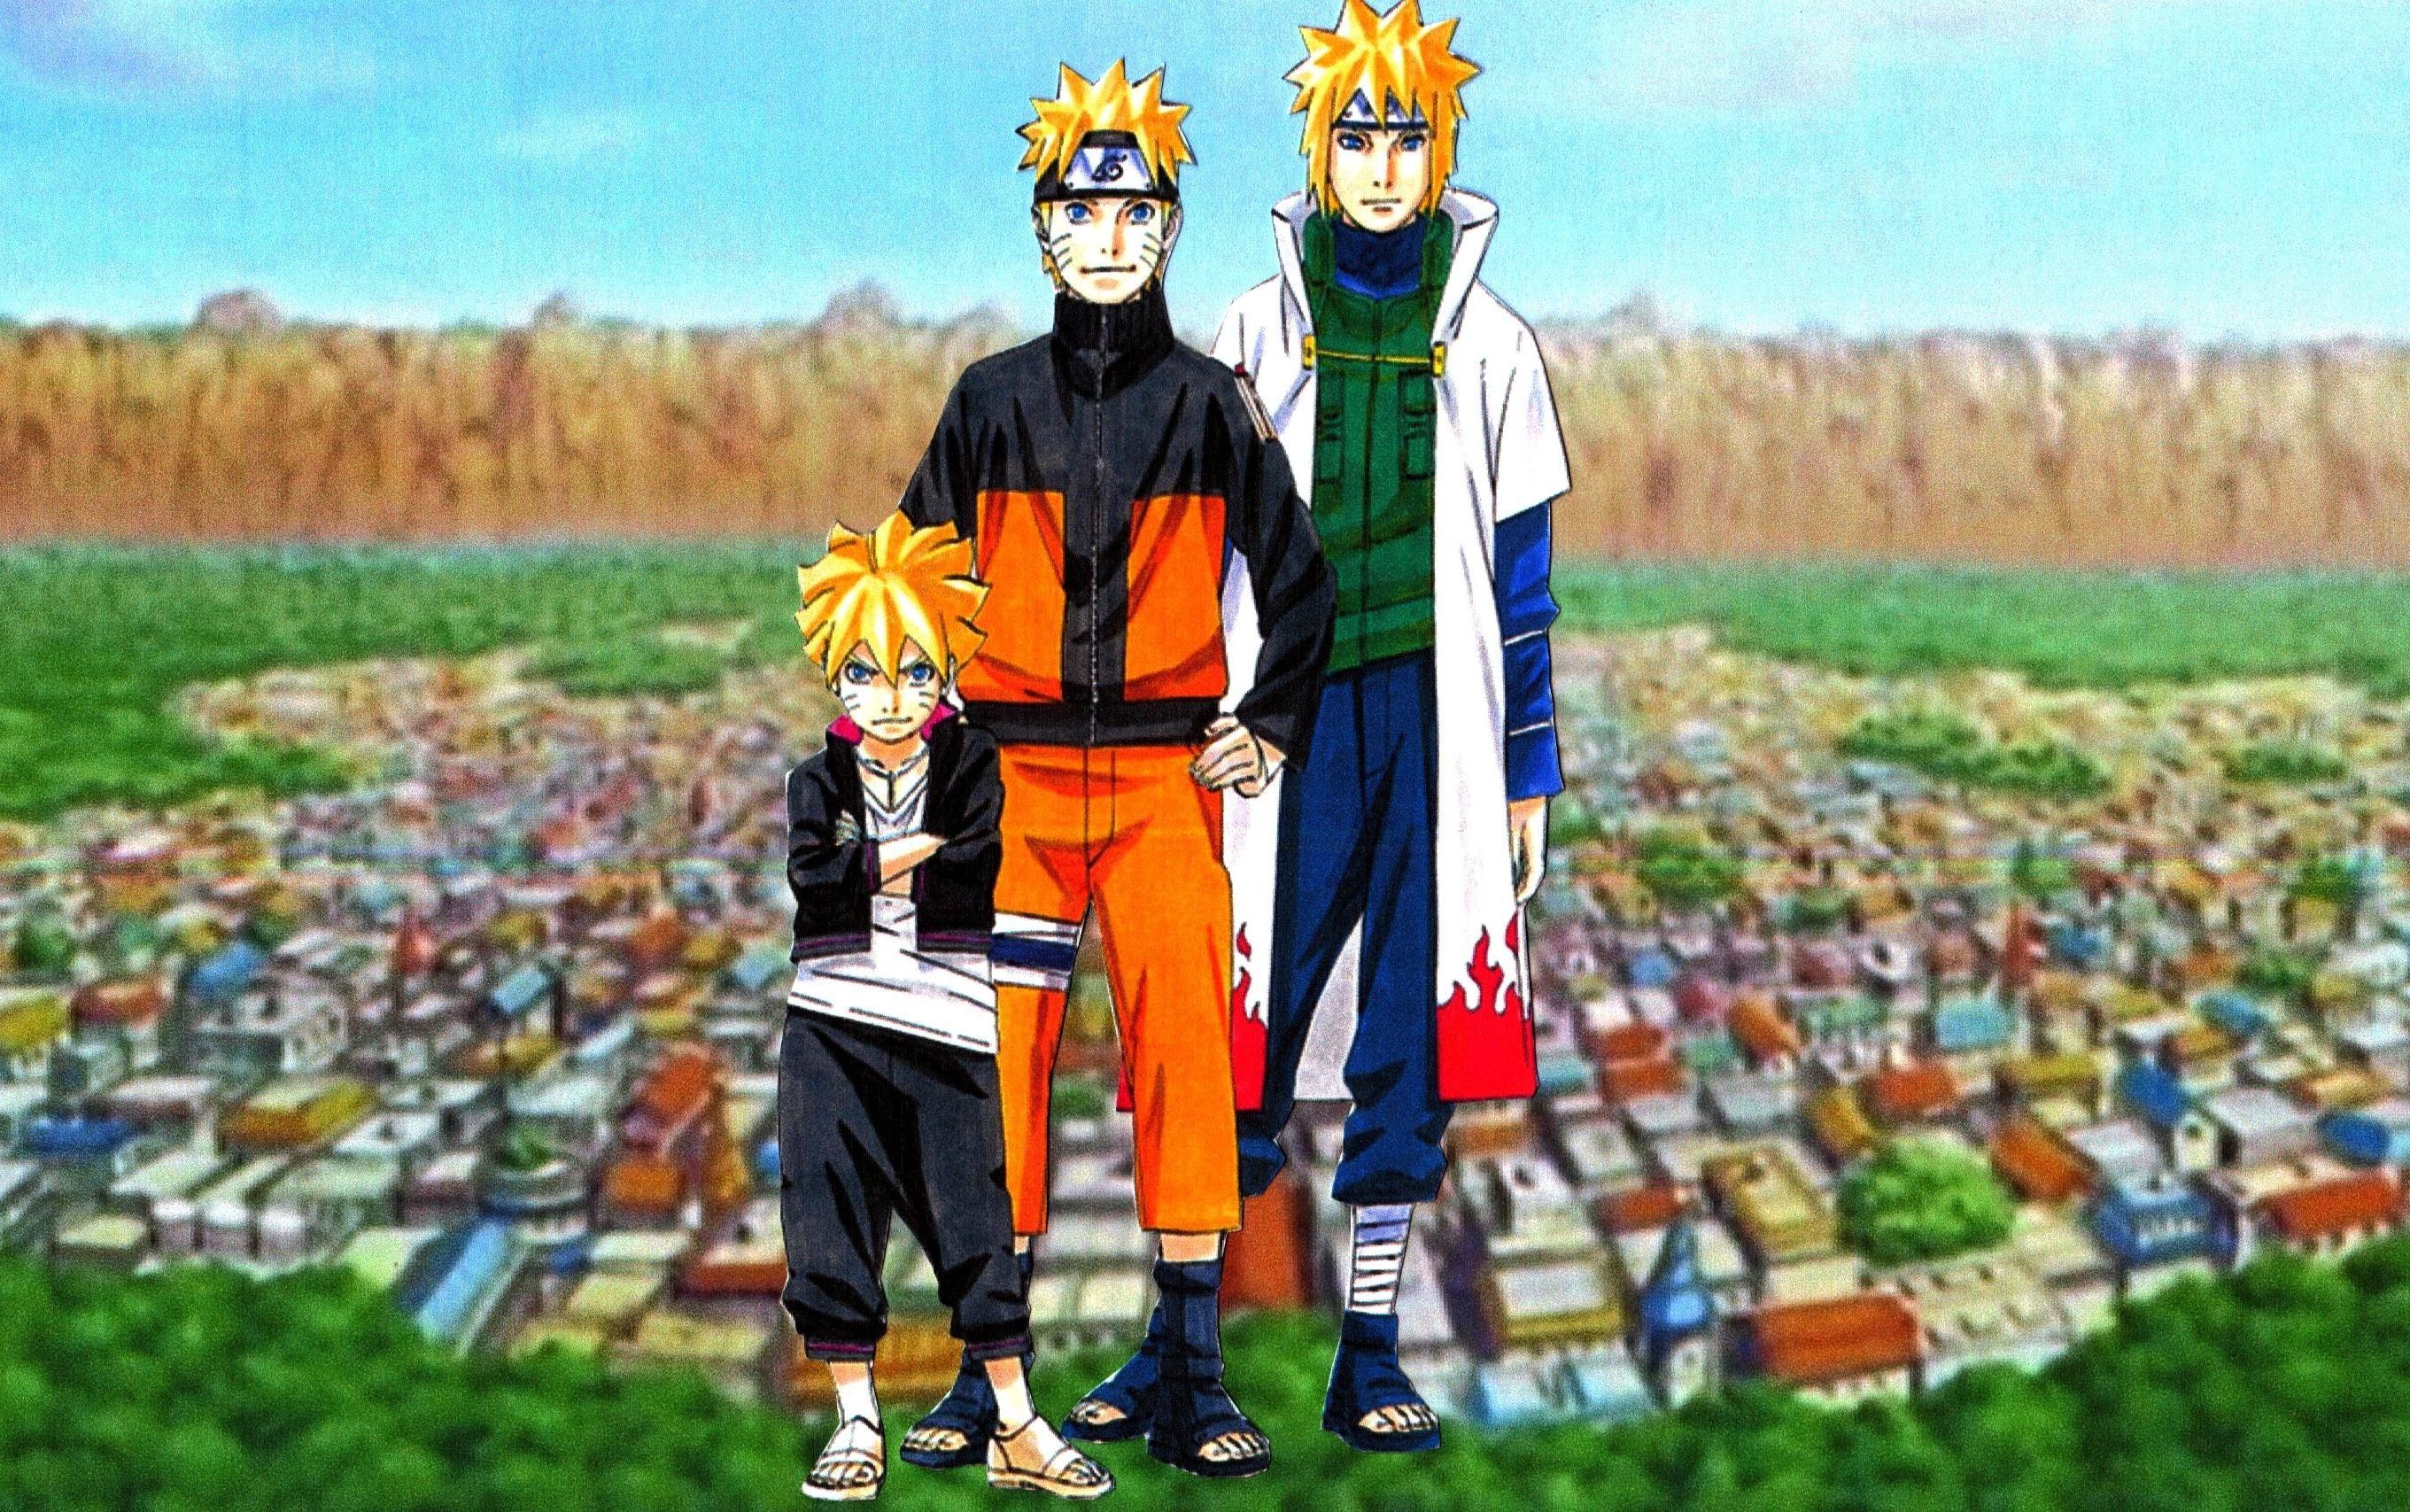 Must see Wallpaper Naruto Boruto - 798515-free-boruto-naruto-the-movie-wallpapers-2721x1707  You Should Have_201210.jpg